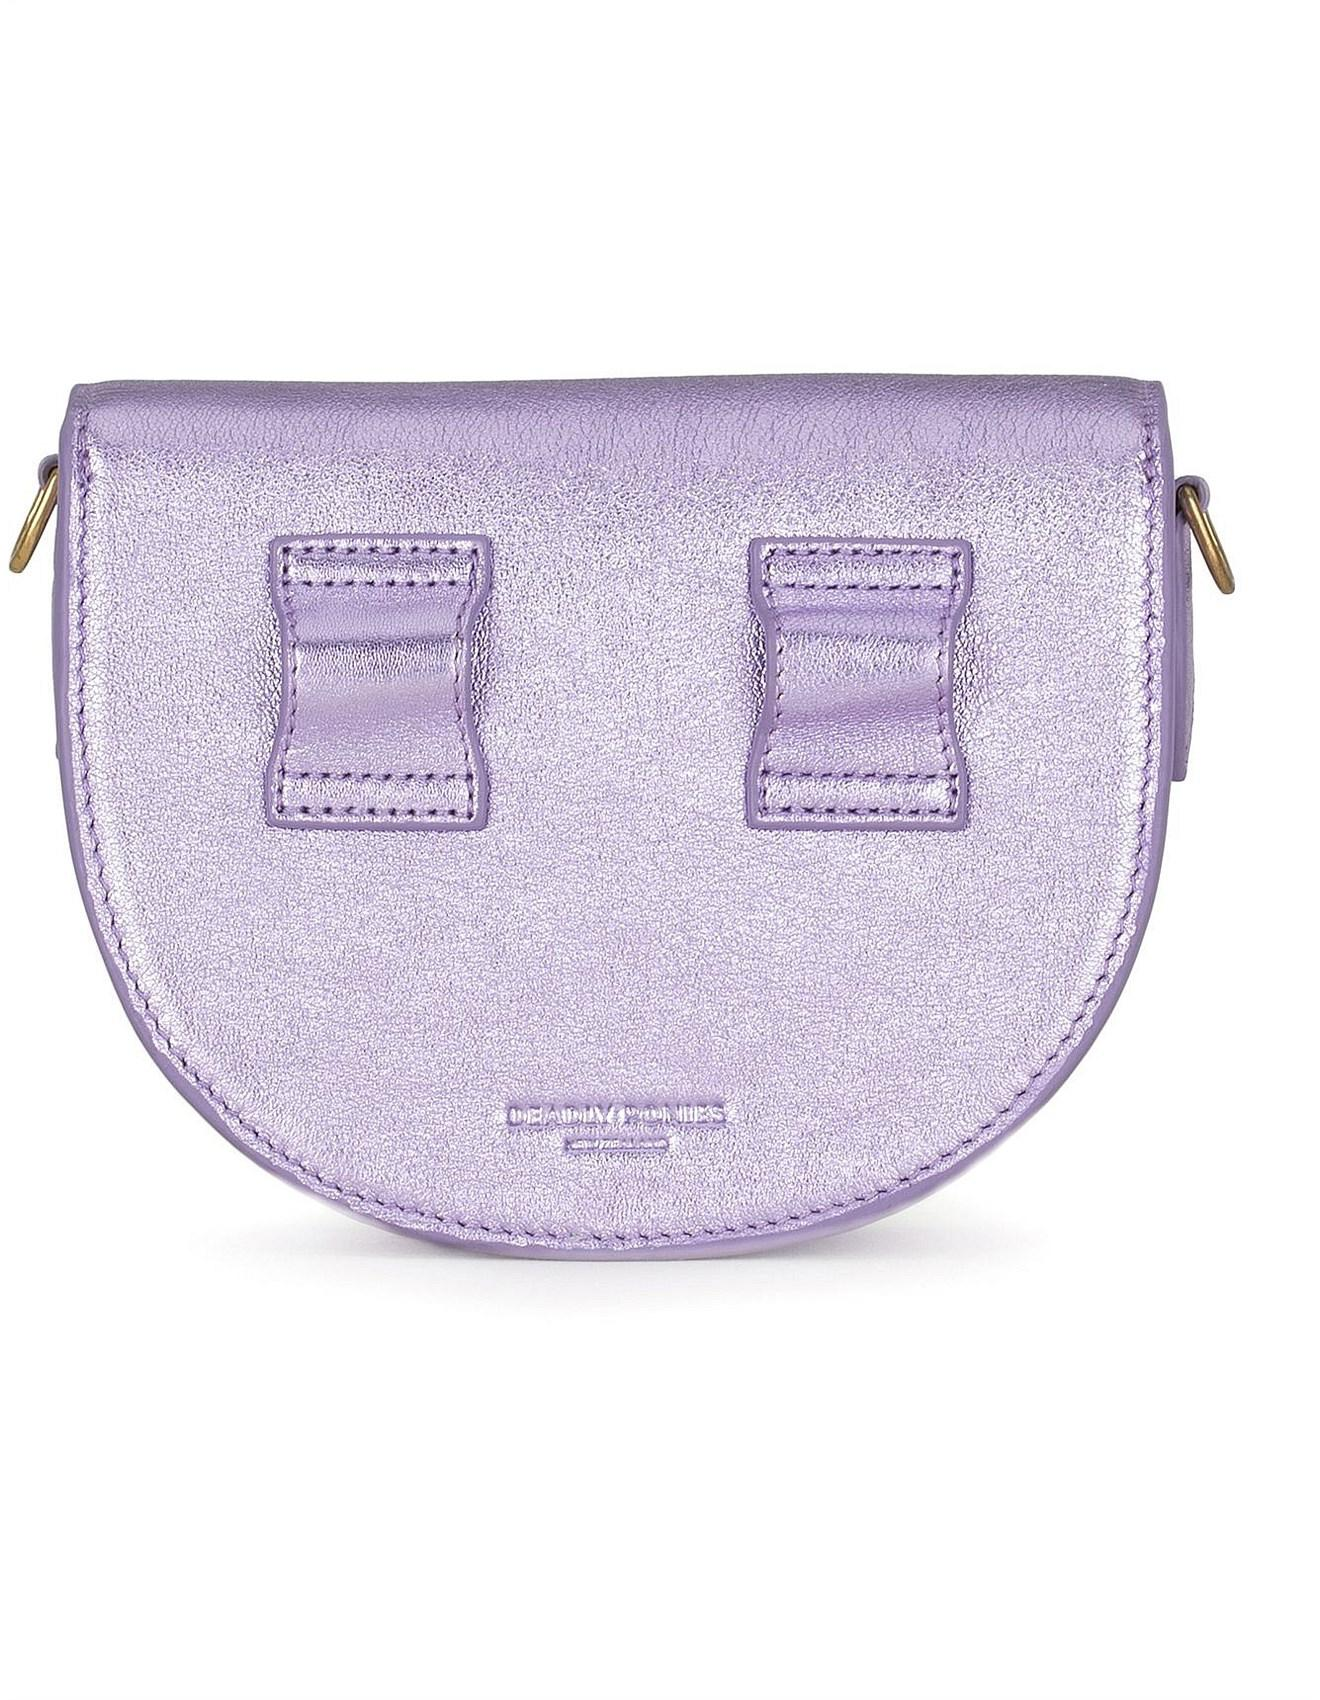 Deadly Ponies Mr Mini Woolf - Metallic Leather Strap Belt Bag in Purple -  Lyst 47b523763af28